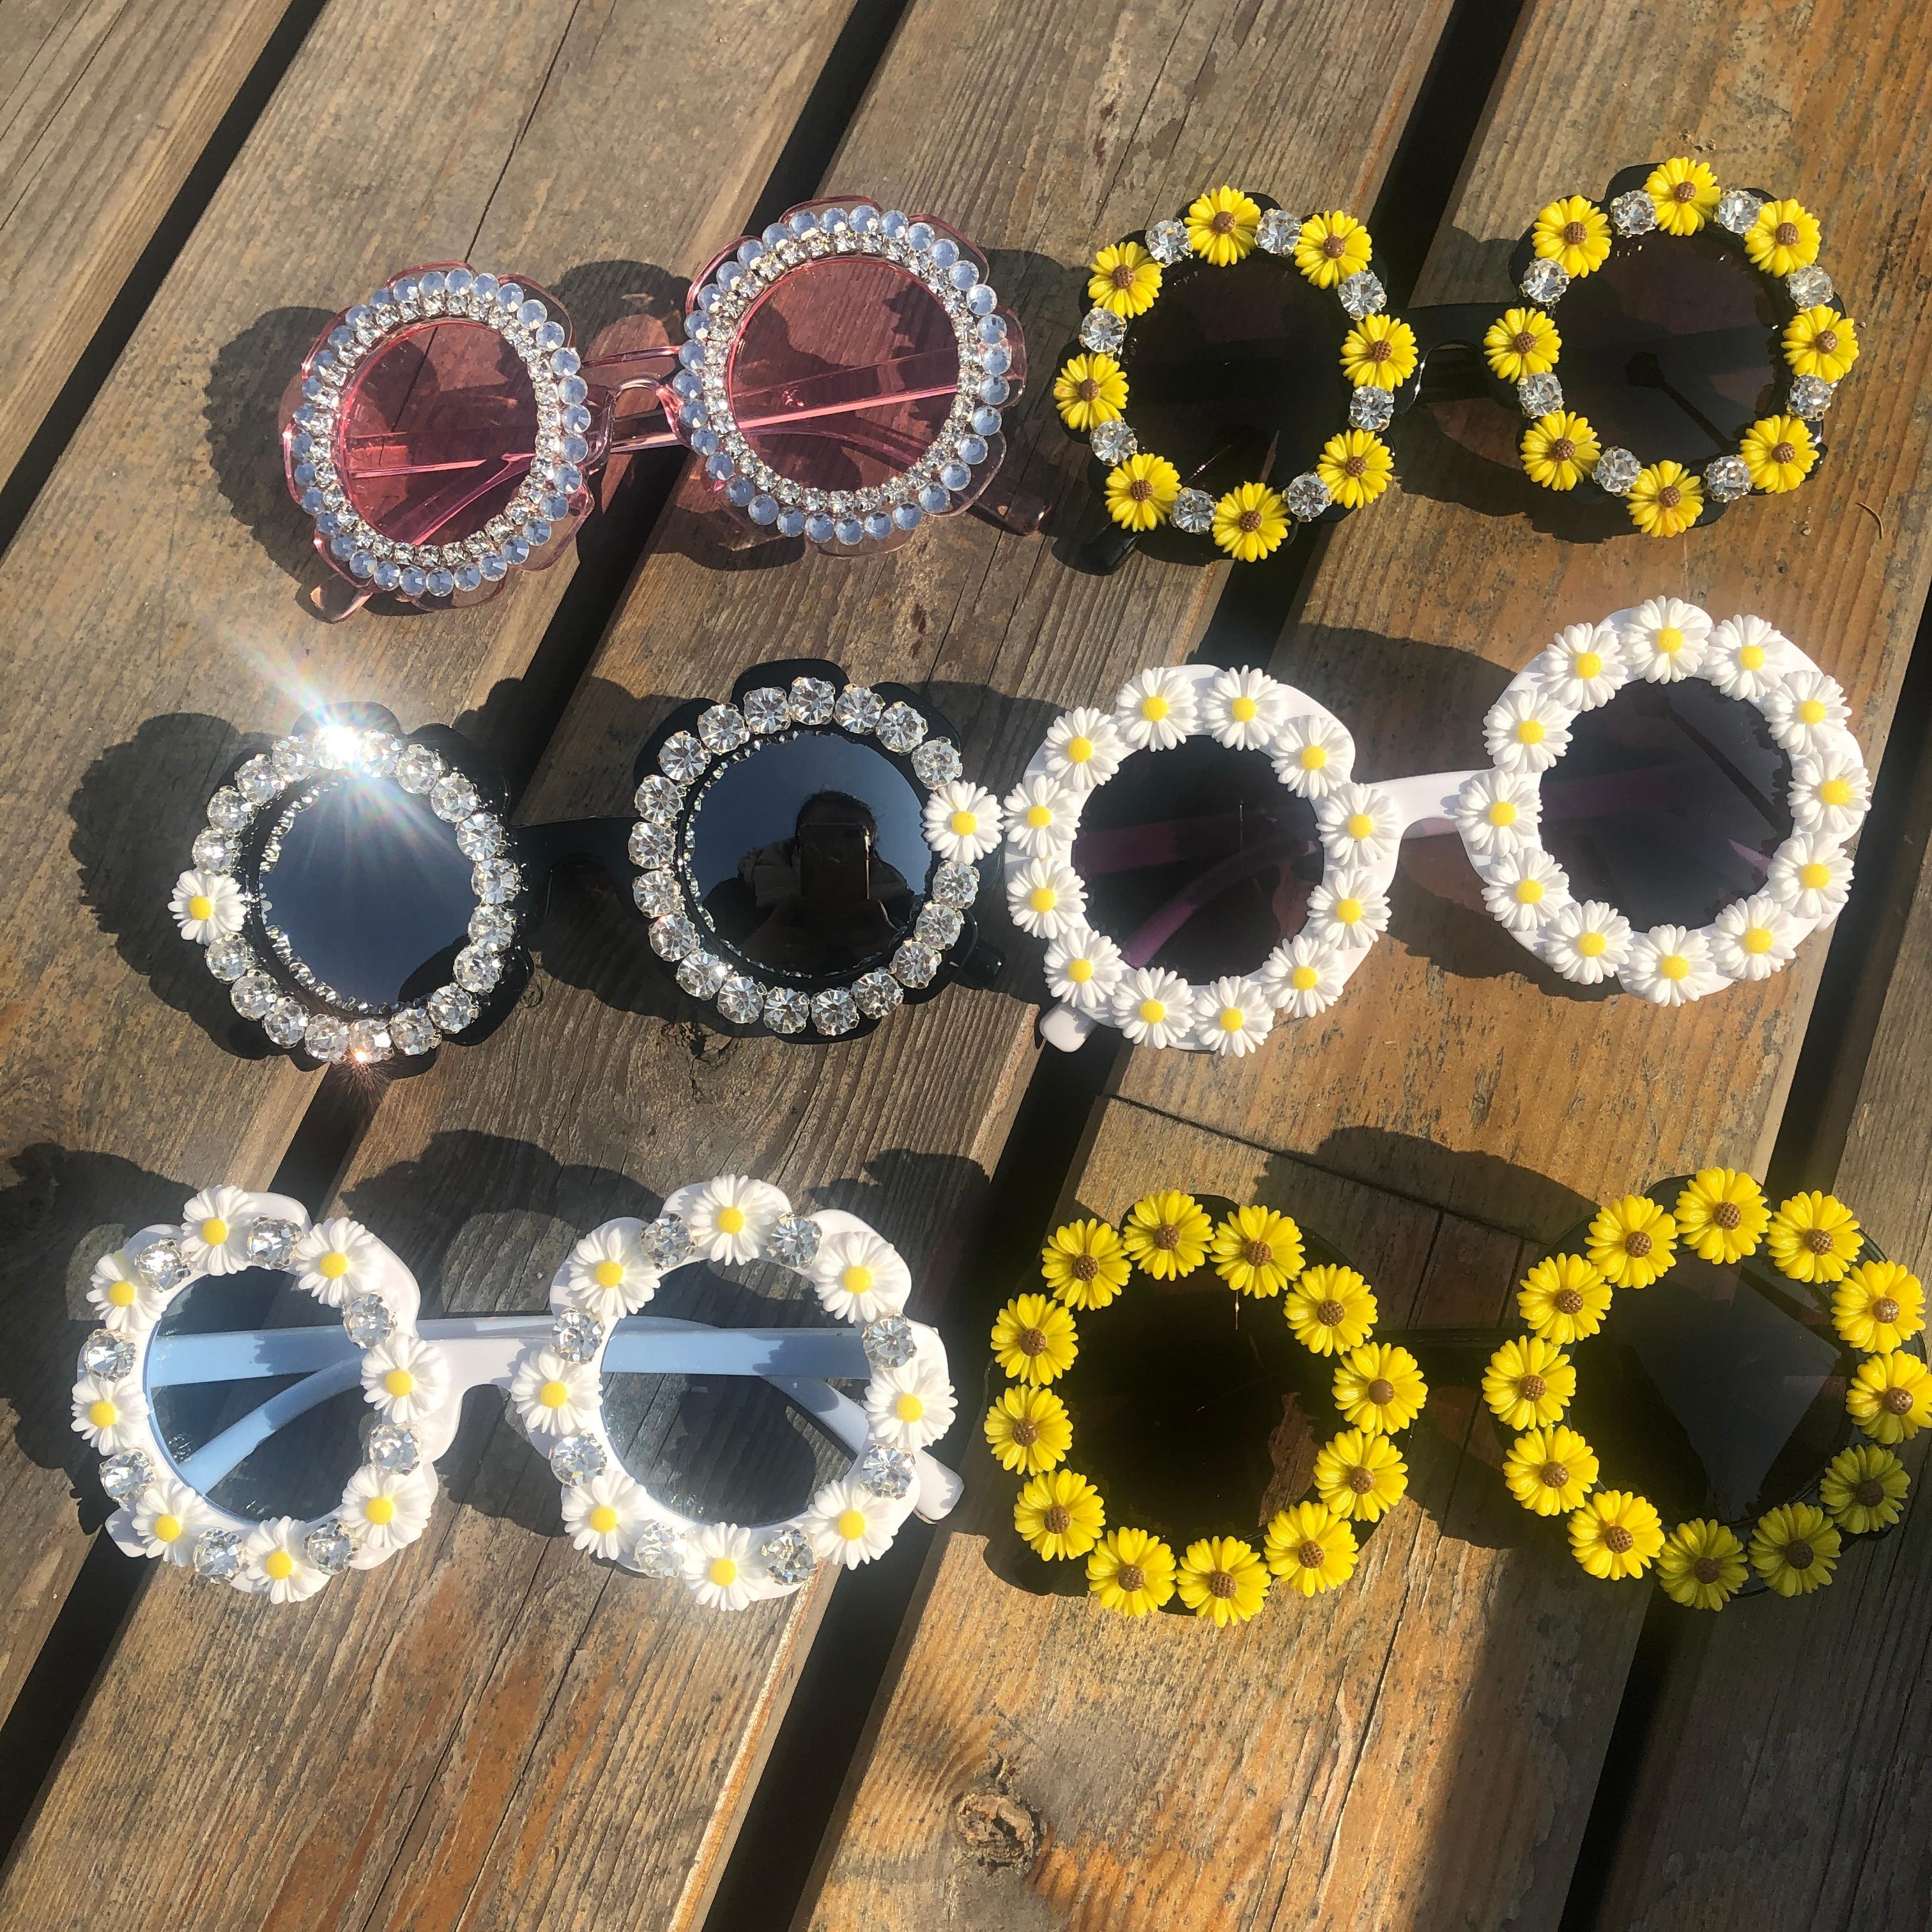 ZAOLIHU Round Kids Diamond Sunglasses Gorgeous Handmade Children Eyewear UV400 Summer Shades Gafas Mirror Lens  Flower Eyeglass